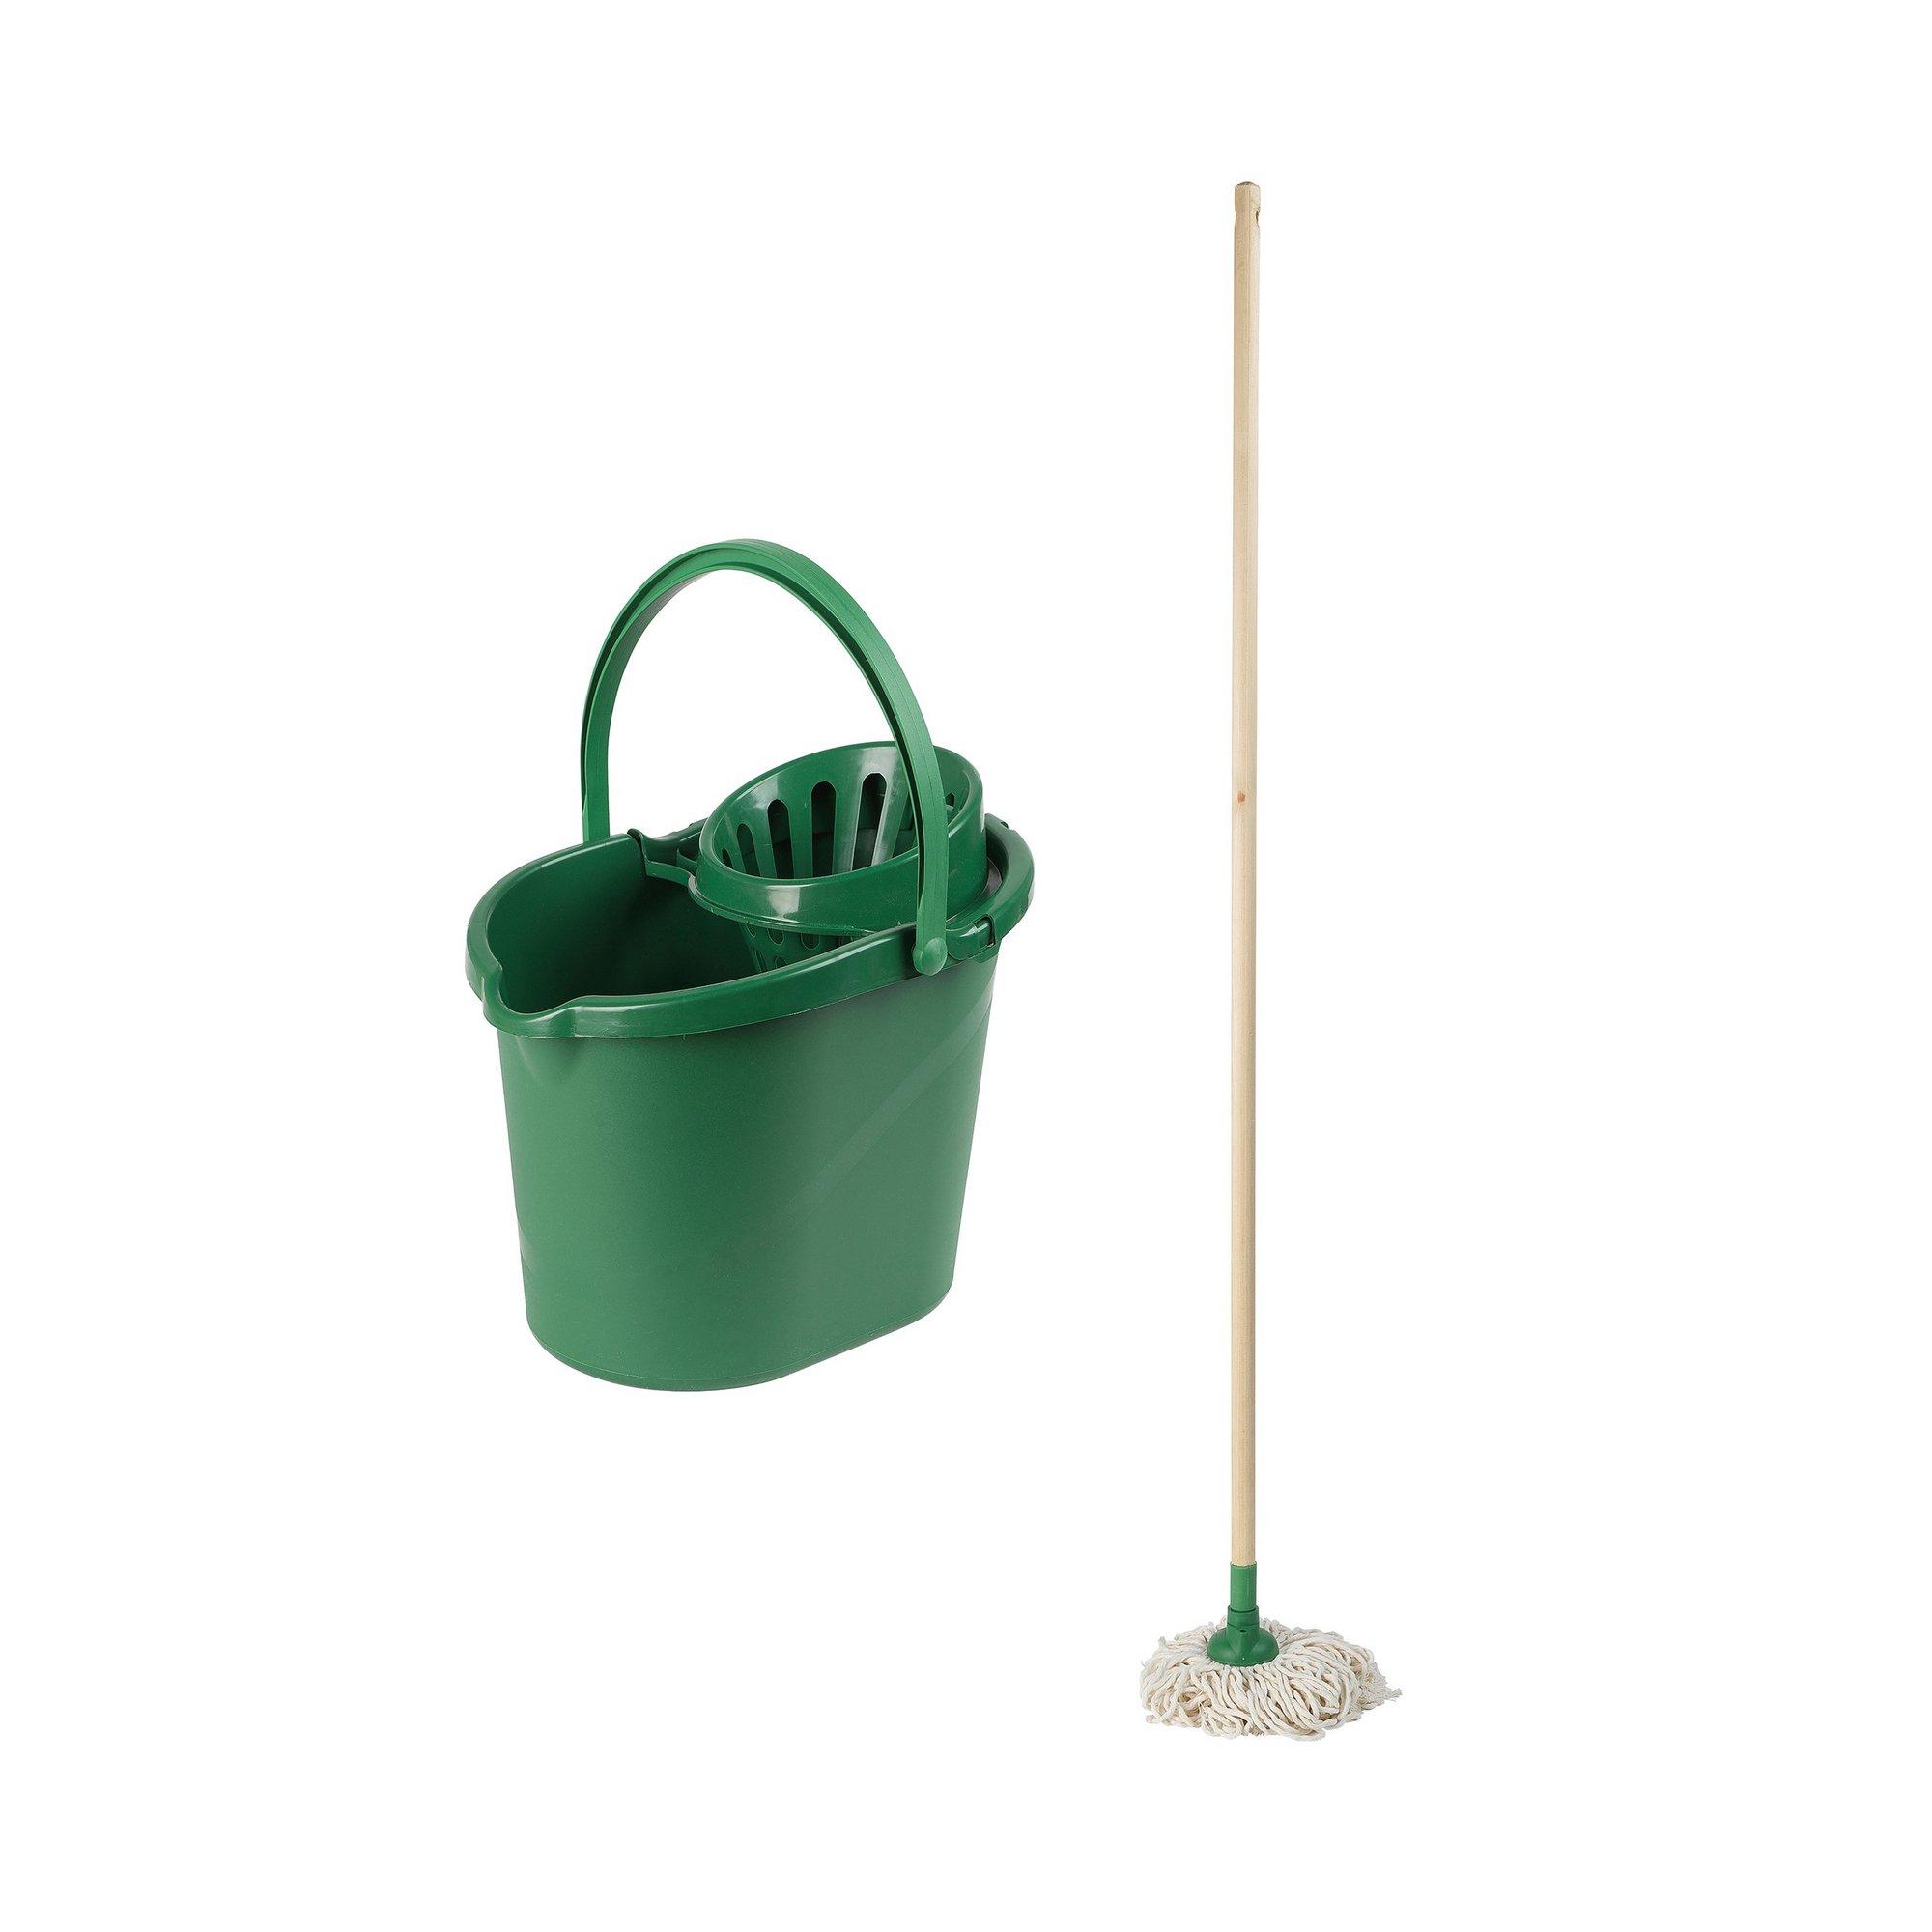 Image of 2 Piece Beldray Eco Mop and Bucket Set